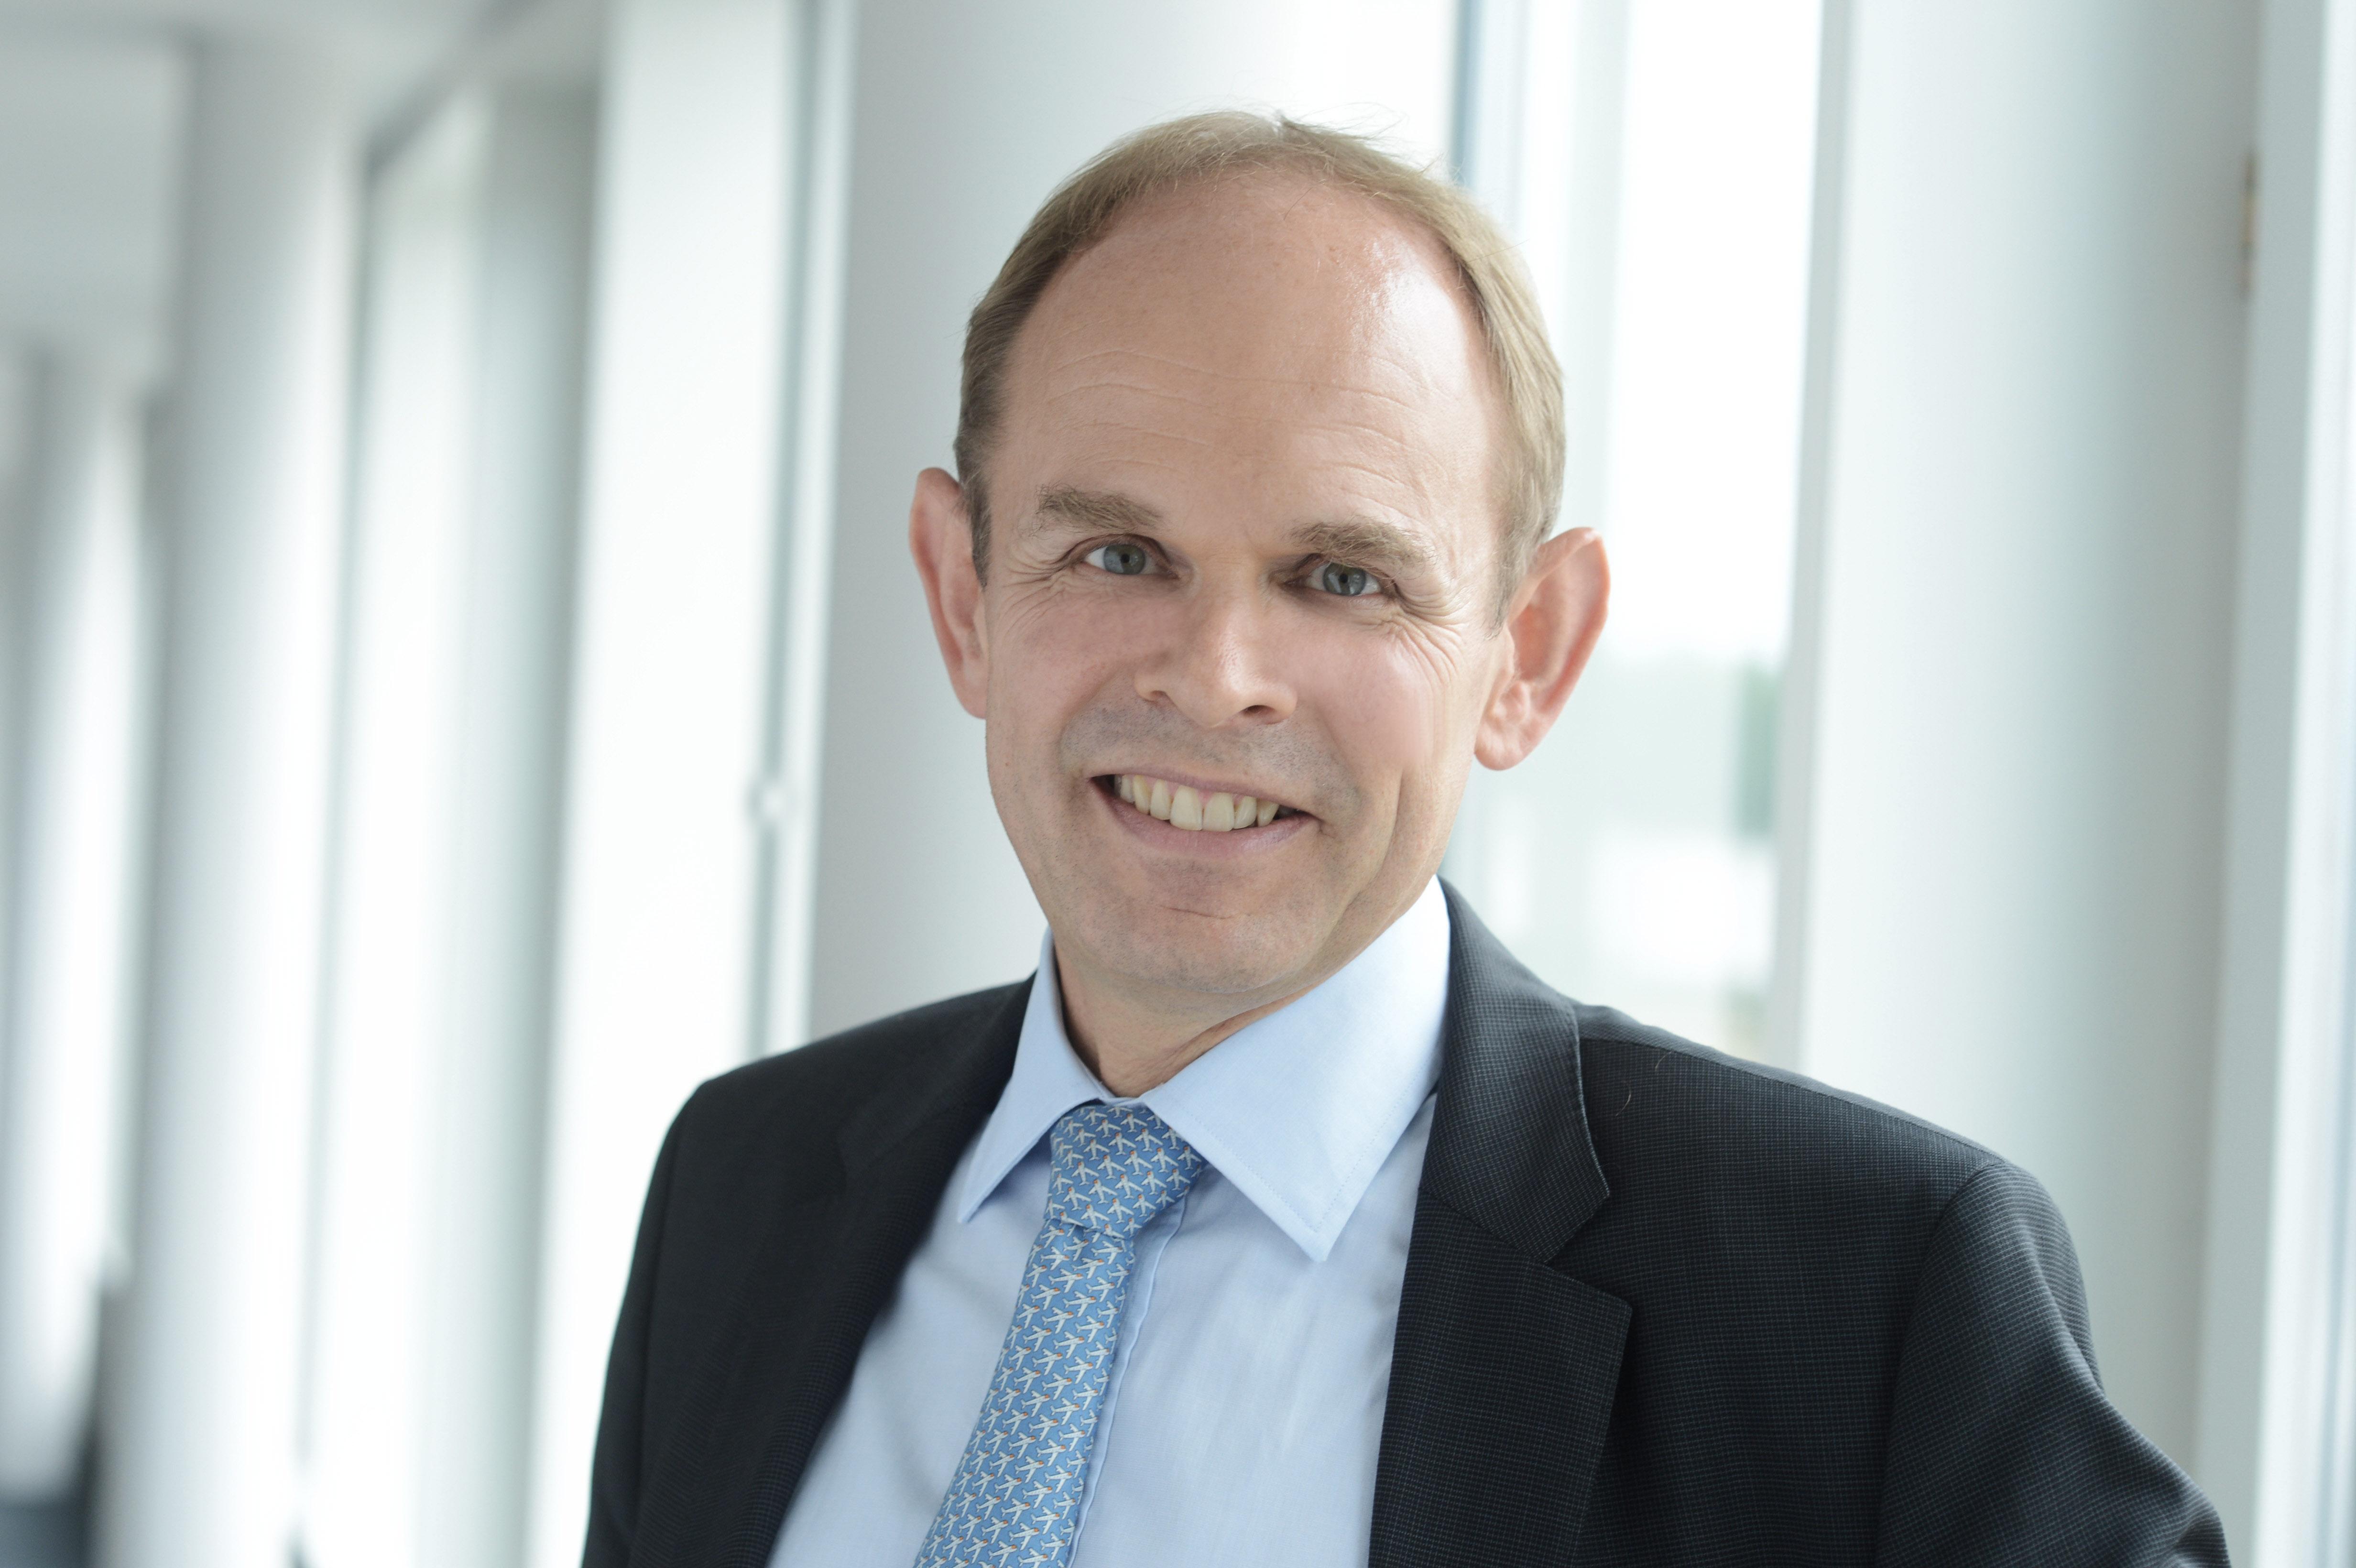 Raymond Cron, CEO of Switzerland Innovation